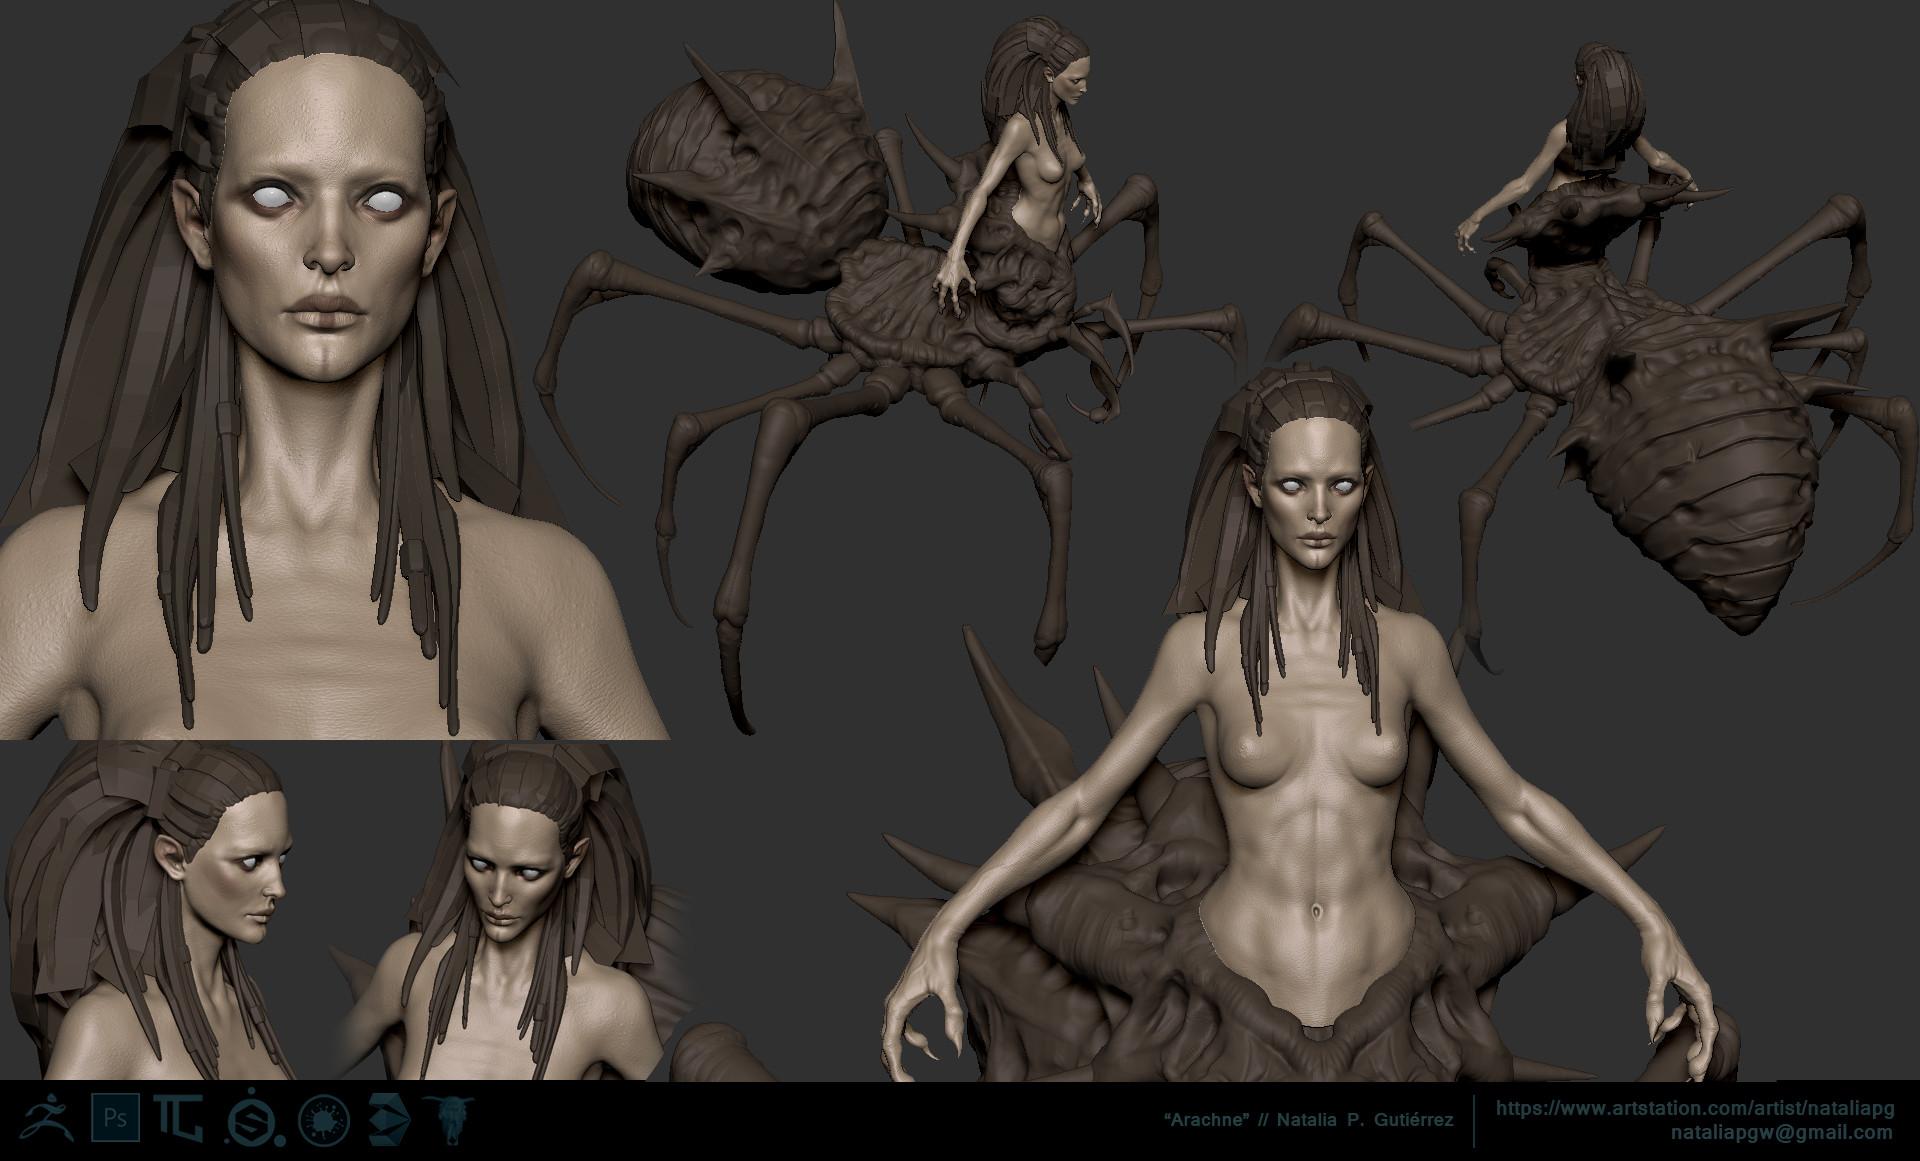 natalia-p-gutierrez-arachneview-11.jpg